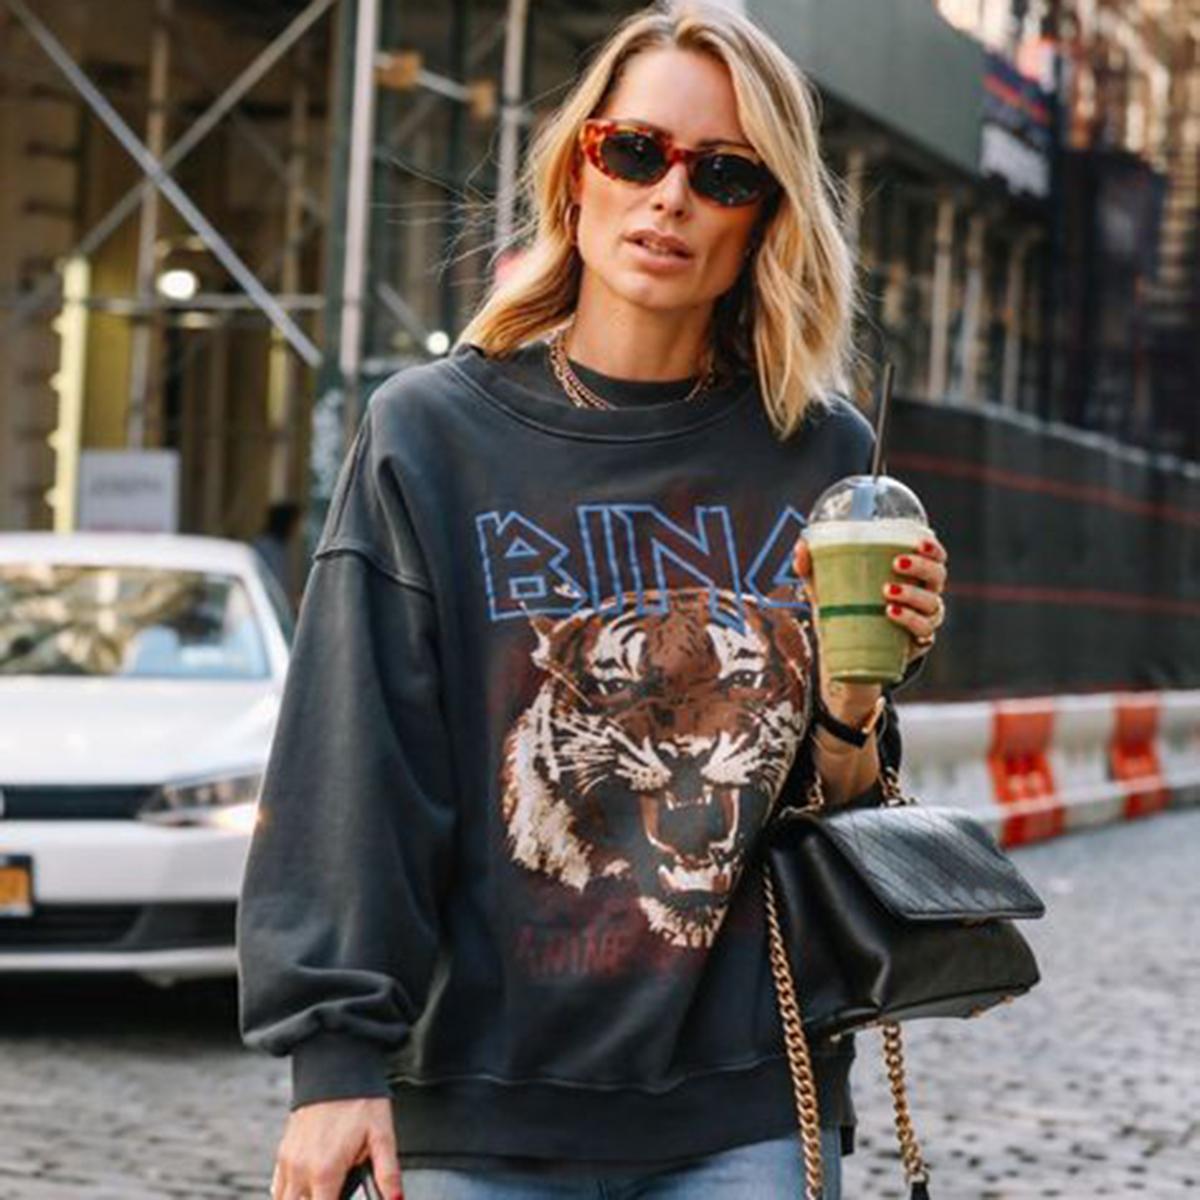 Black Tiger Kopf Grafik Boho Sweatshirt Frauen Herbst-Winter-lange Hülse O Ansatz 100% Cotton Pullover Lässige Vintage-Pullover 2020 Y1109